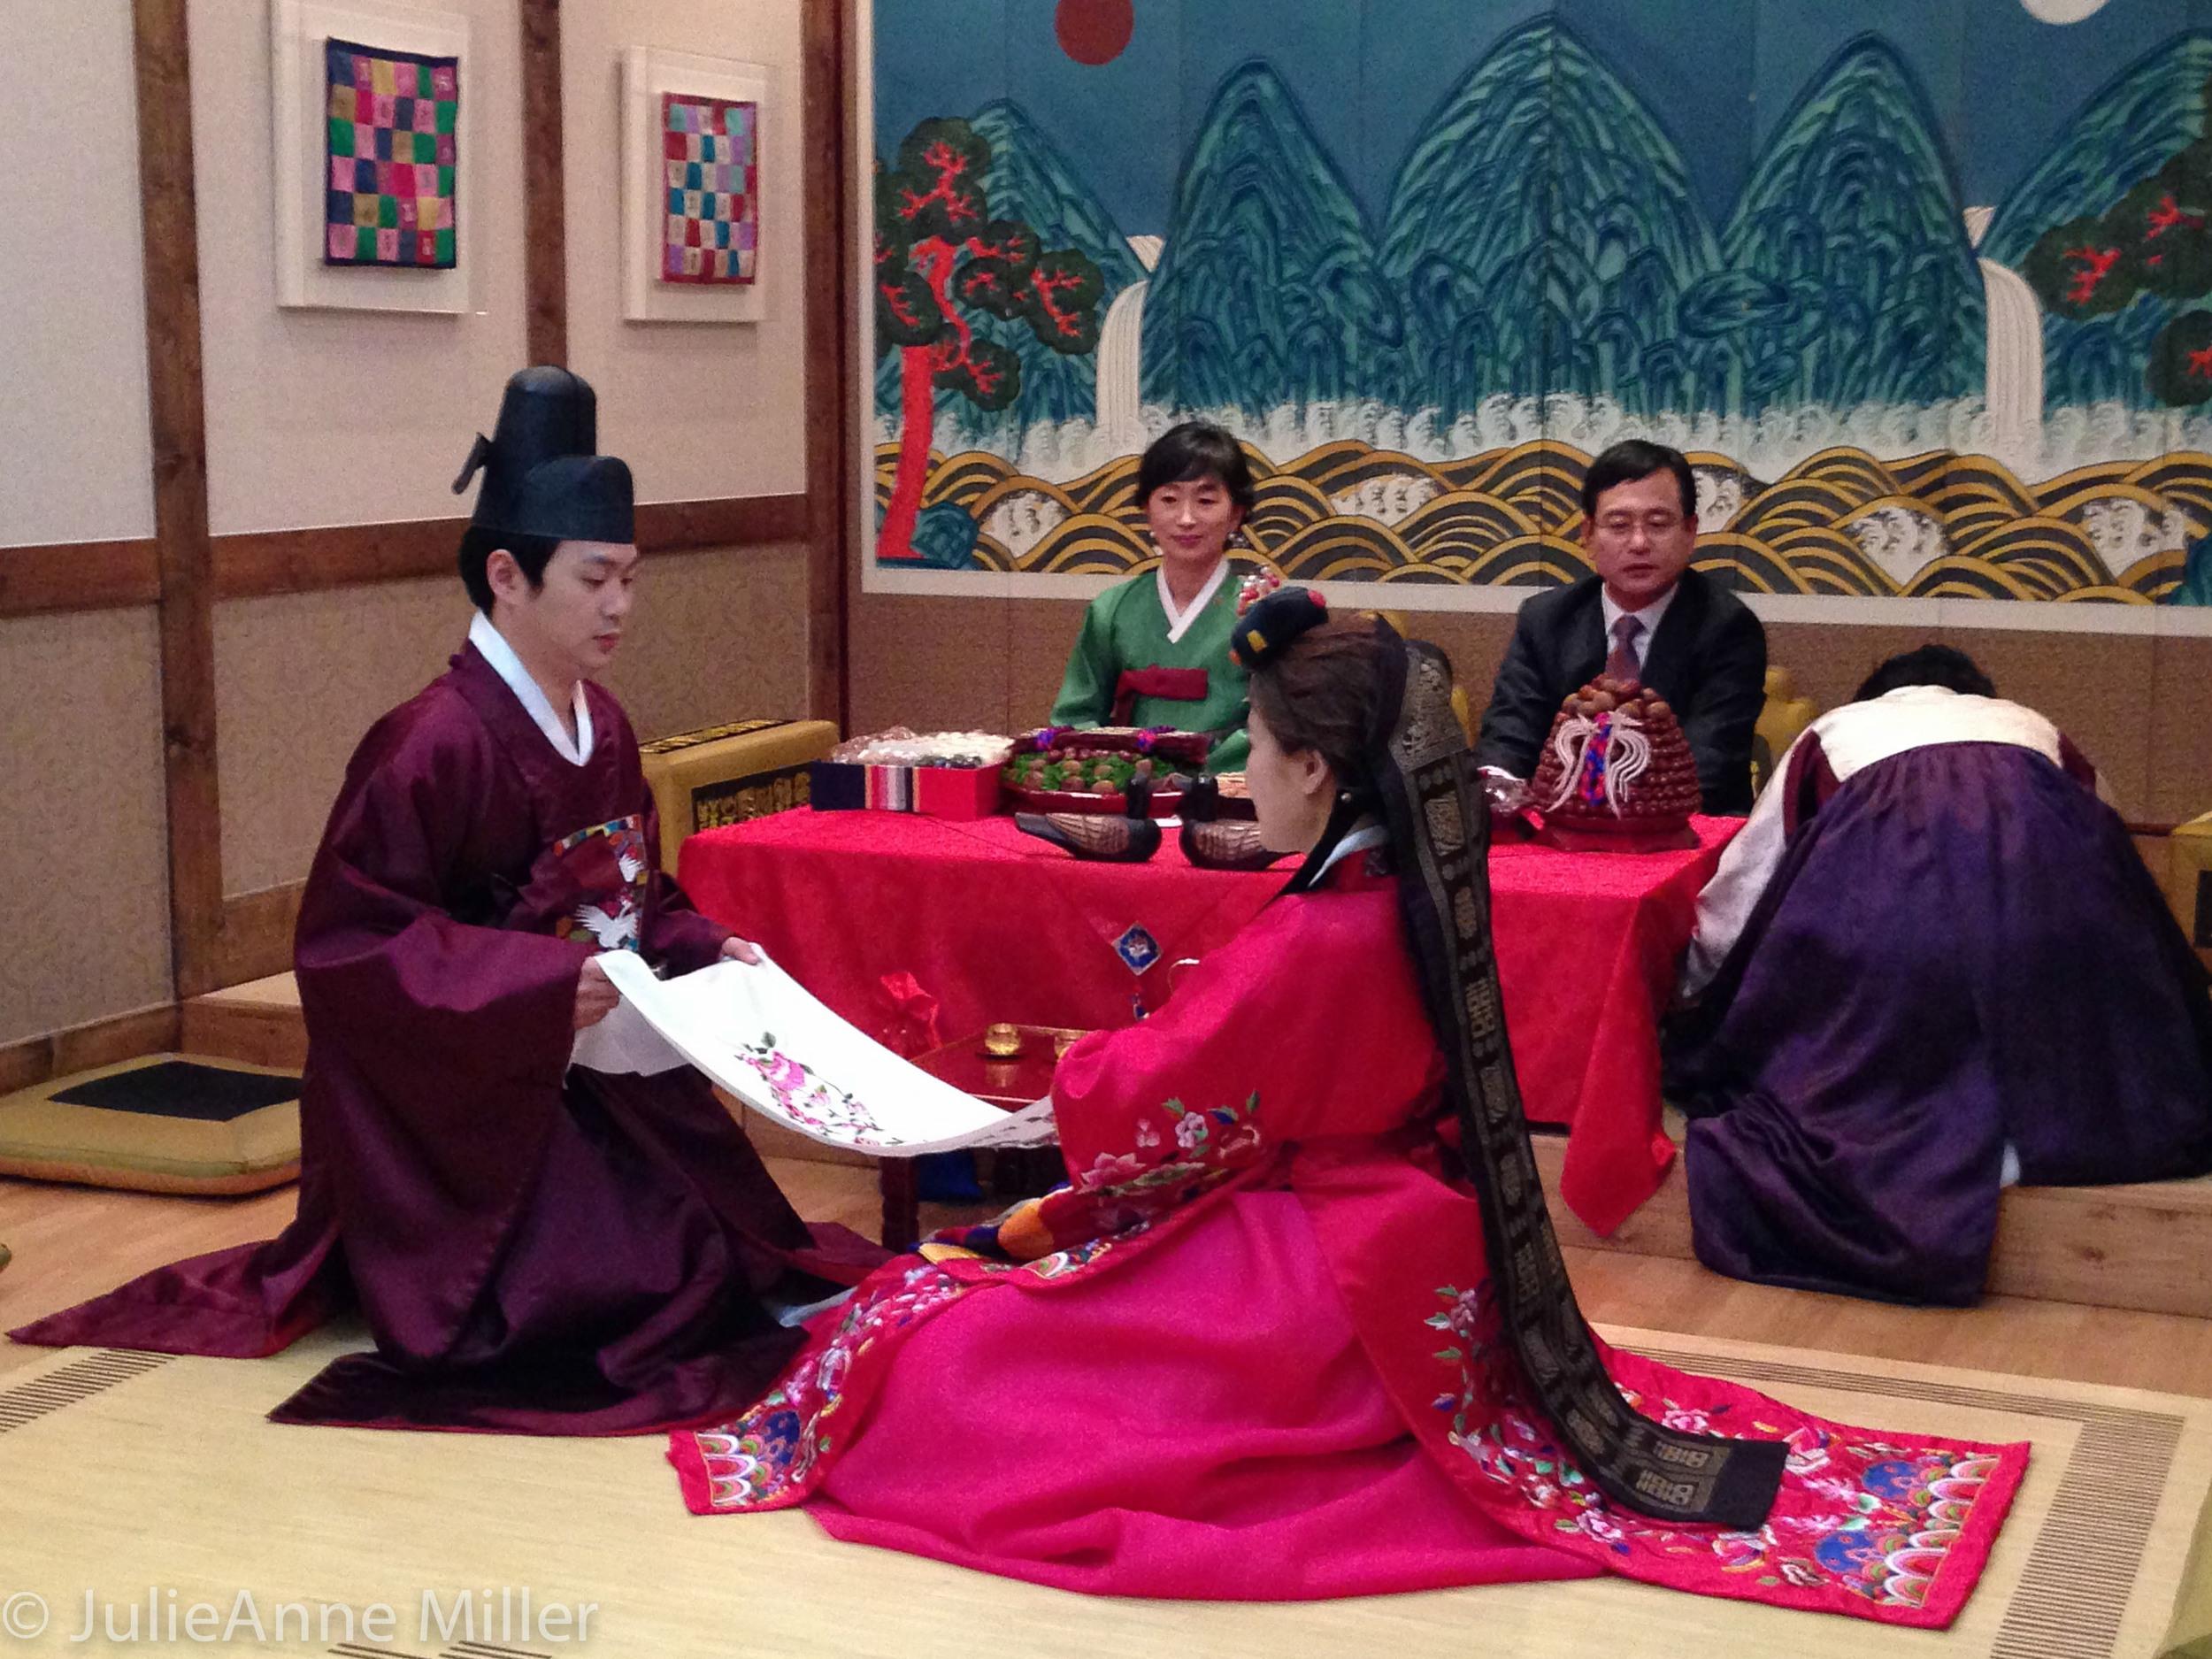 Pyaepaek 폐백 ceremony